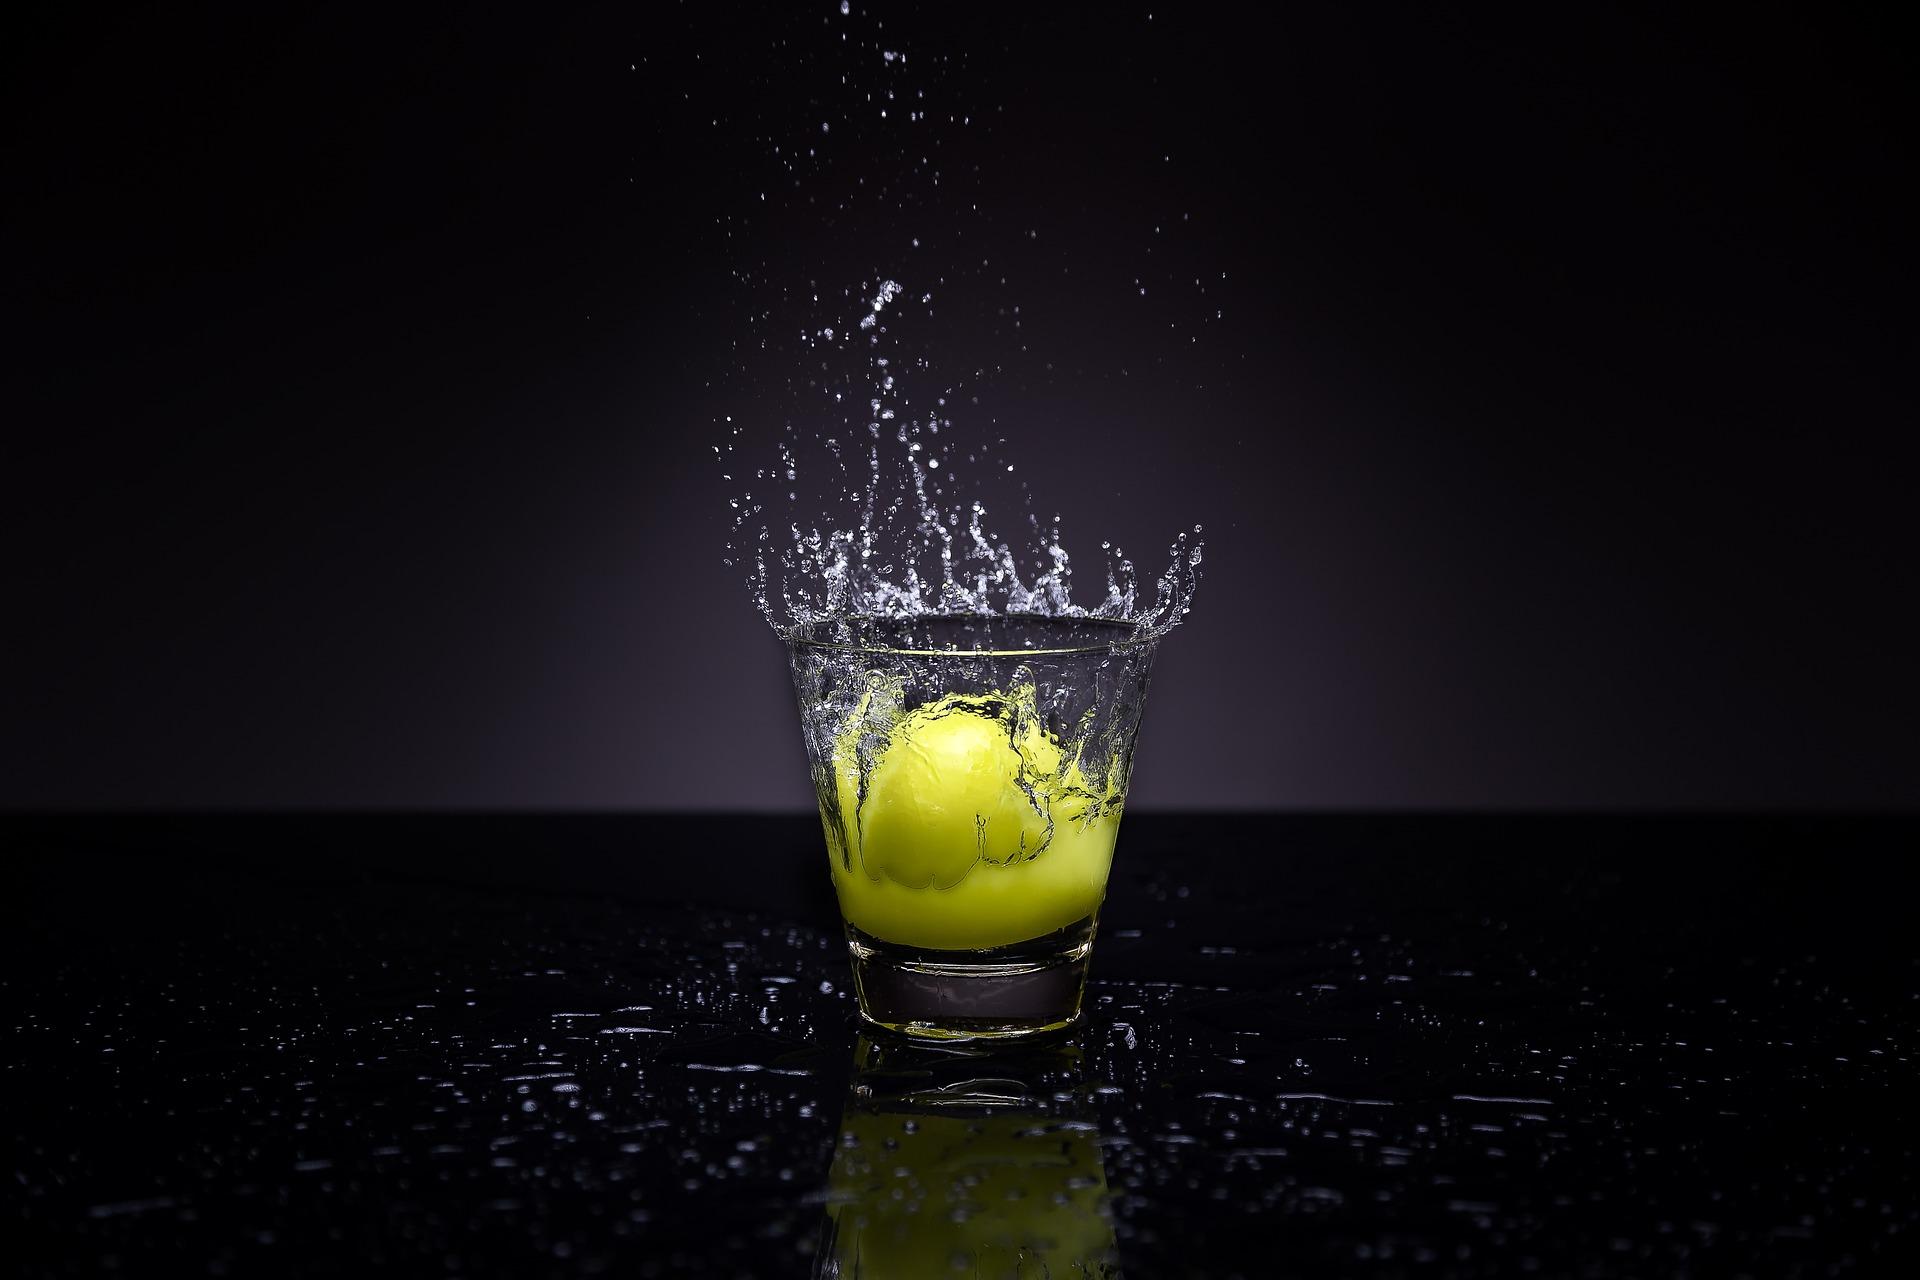 eau, verre, citron, DROPS numéro, Splash - Fonds d'écran HD - Professor-falken.com